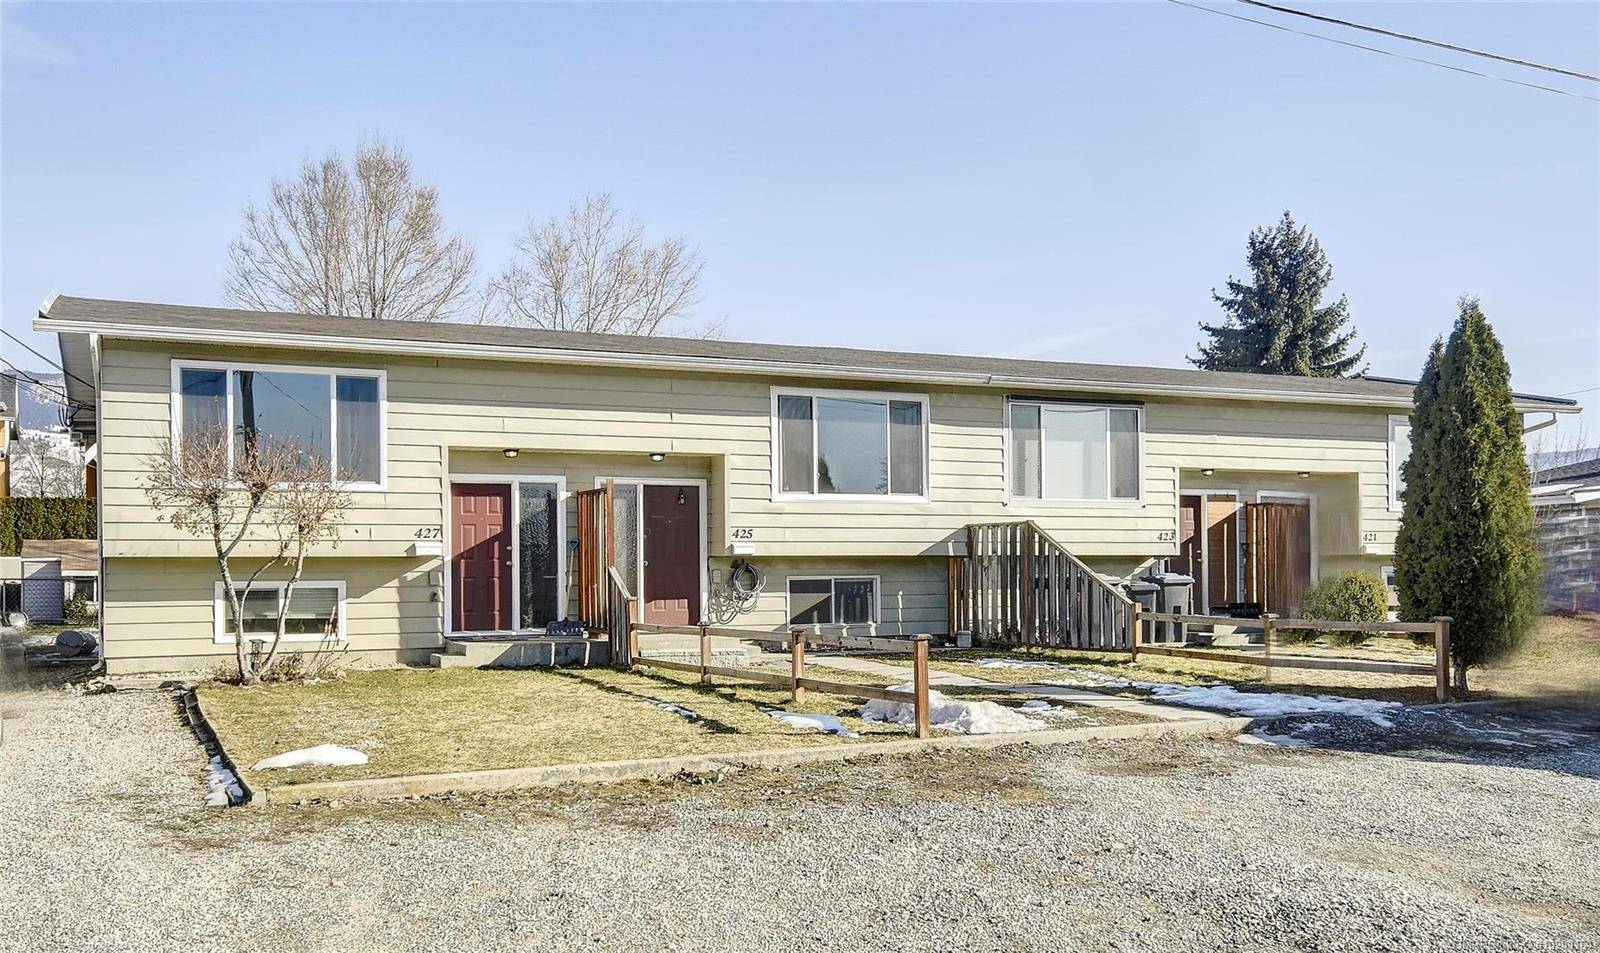 Townhouse for sale at 425 Fleming Rd Kelowna British Columbia - MLS: 10200164